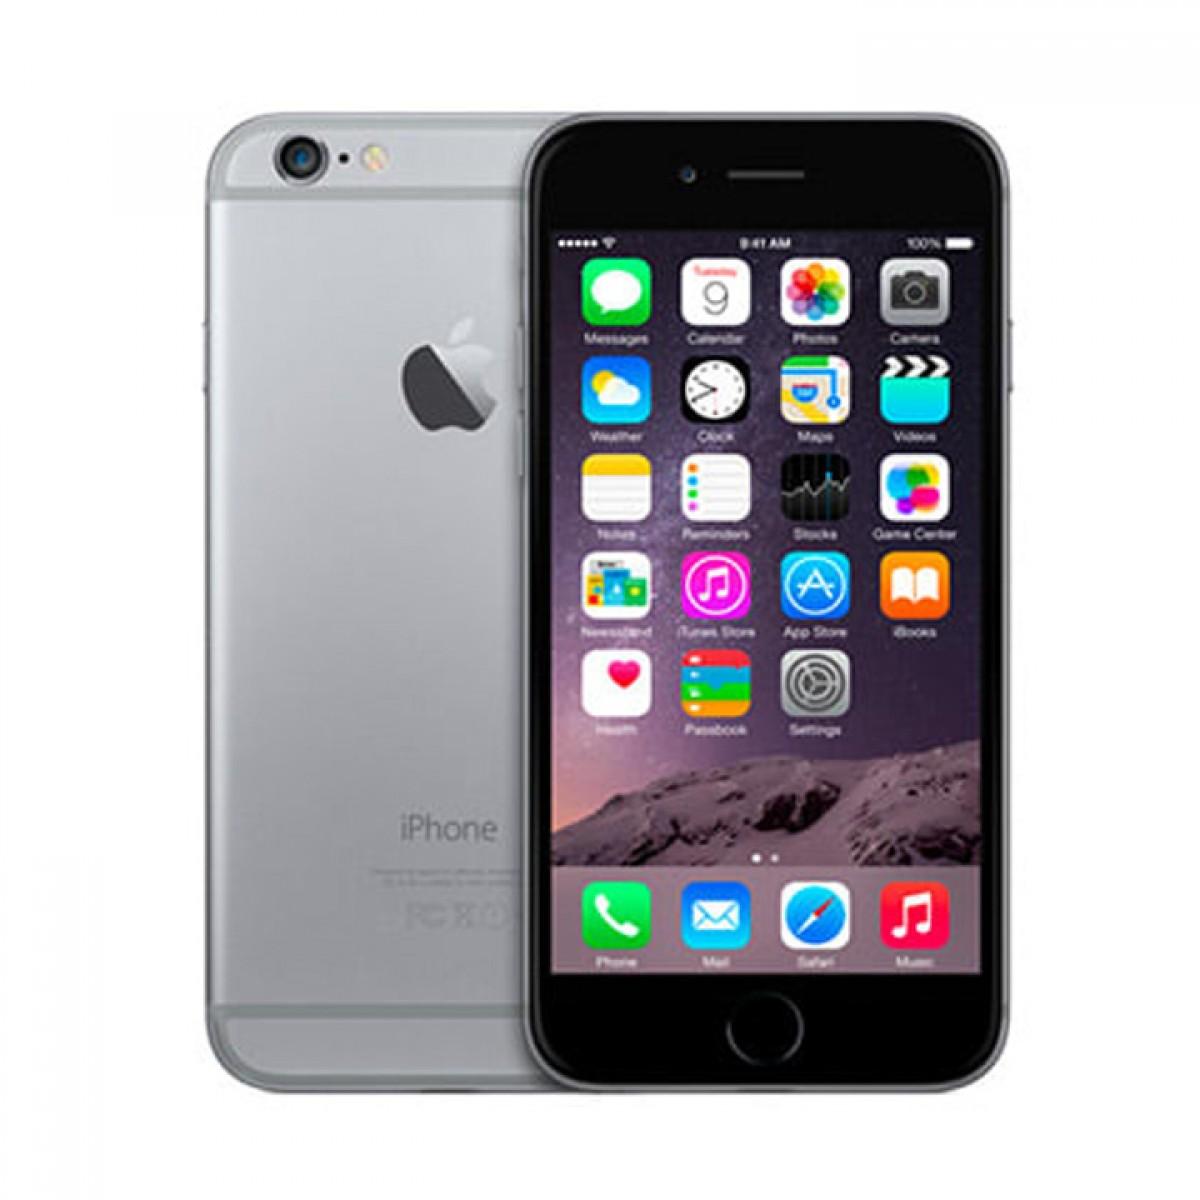 iPhone 6 - Bản Quốc Tế - Likenew 99%